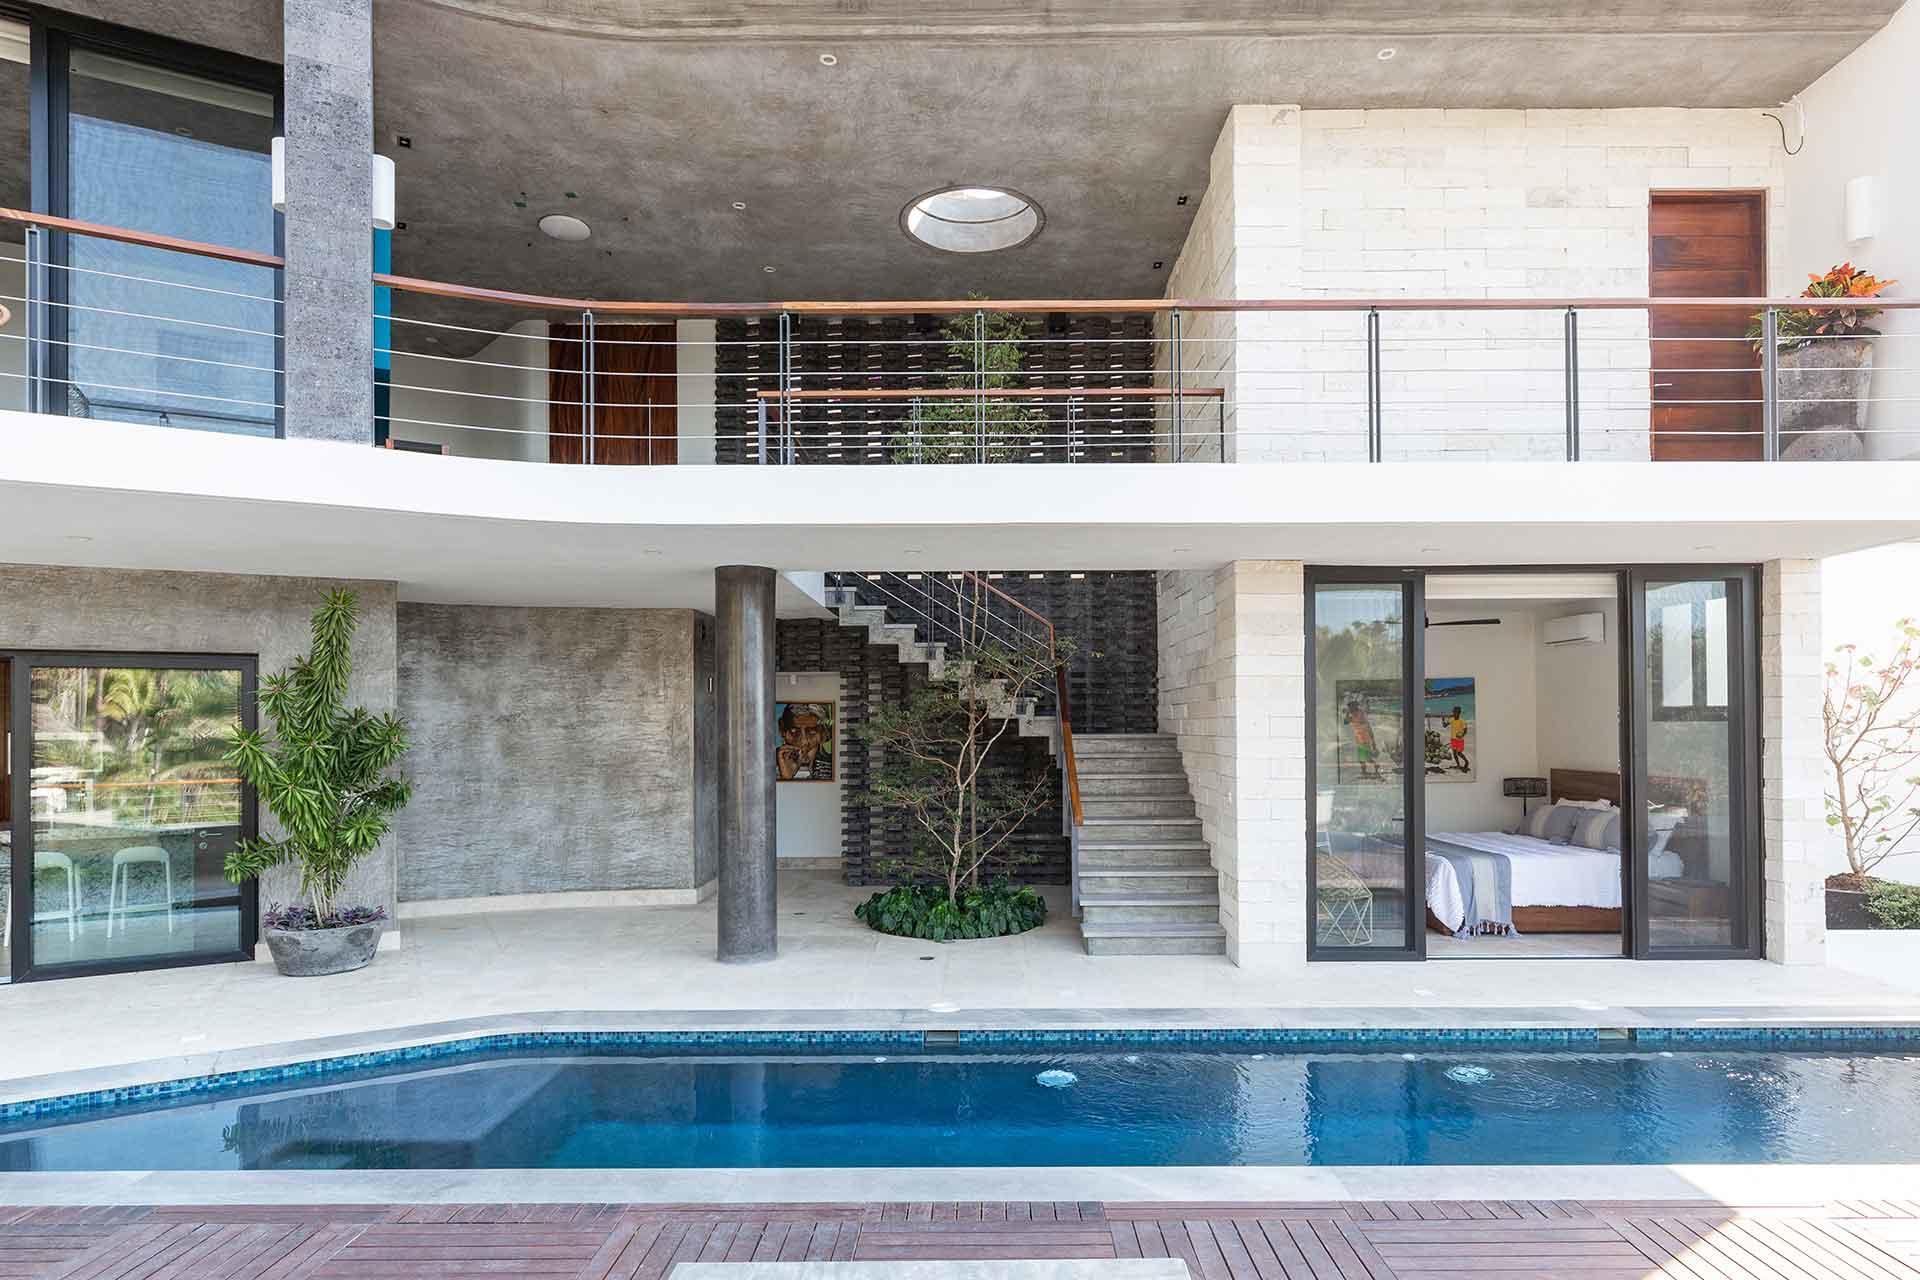 San Pancho, 6 Bedrooms Bedrooms, ,7 BathroomsBathrooms,House,For Sale,Calle Las Palmas,20883